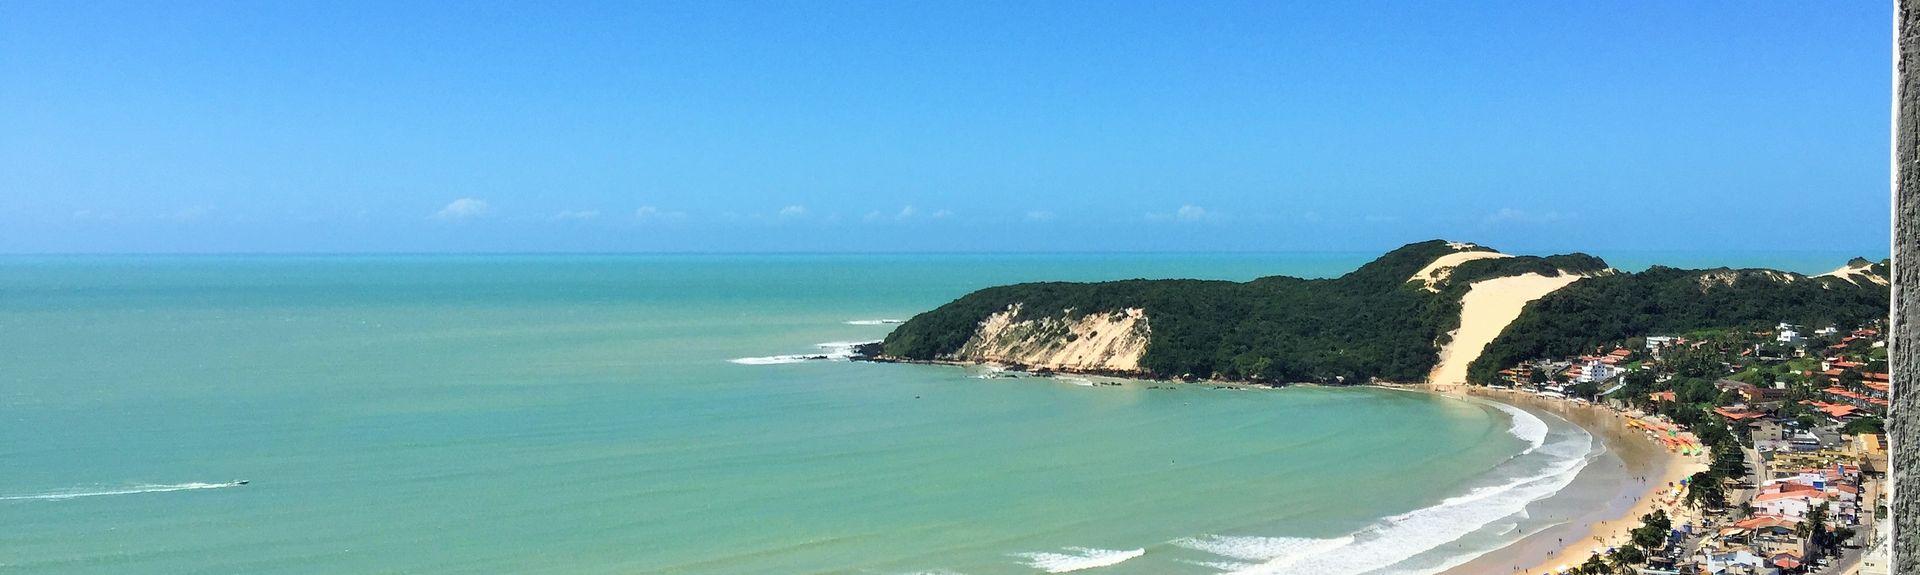 Ponta Negra, Natal, Rio Grande do Norte (state), Brazil